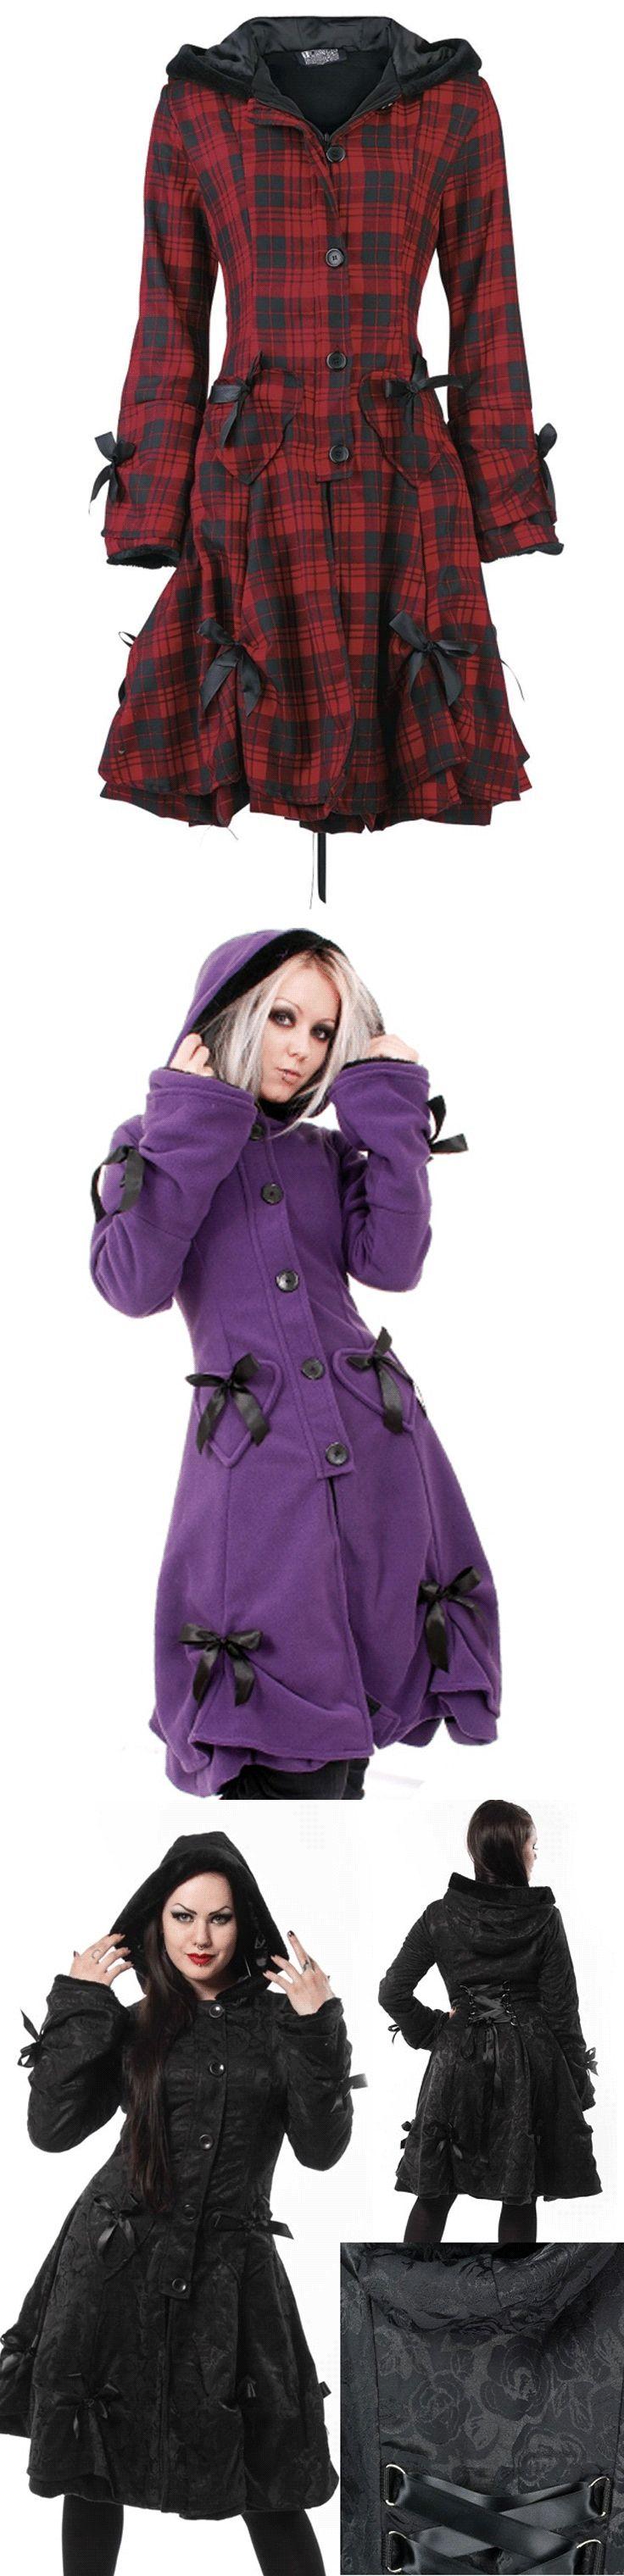 Shop cute goth coats for fall at RebelsMarket!